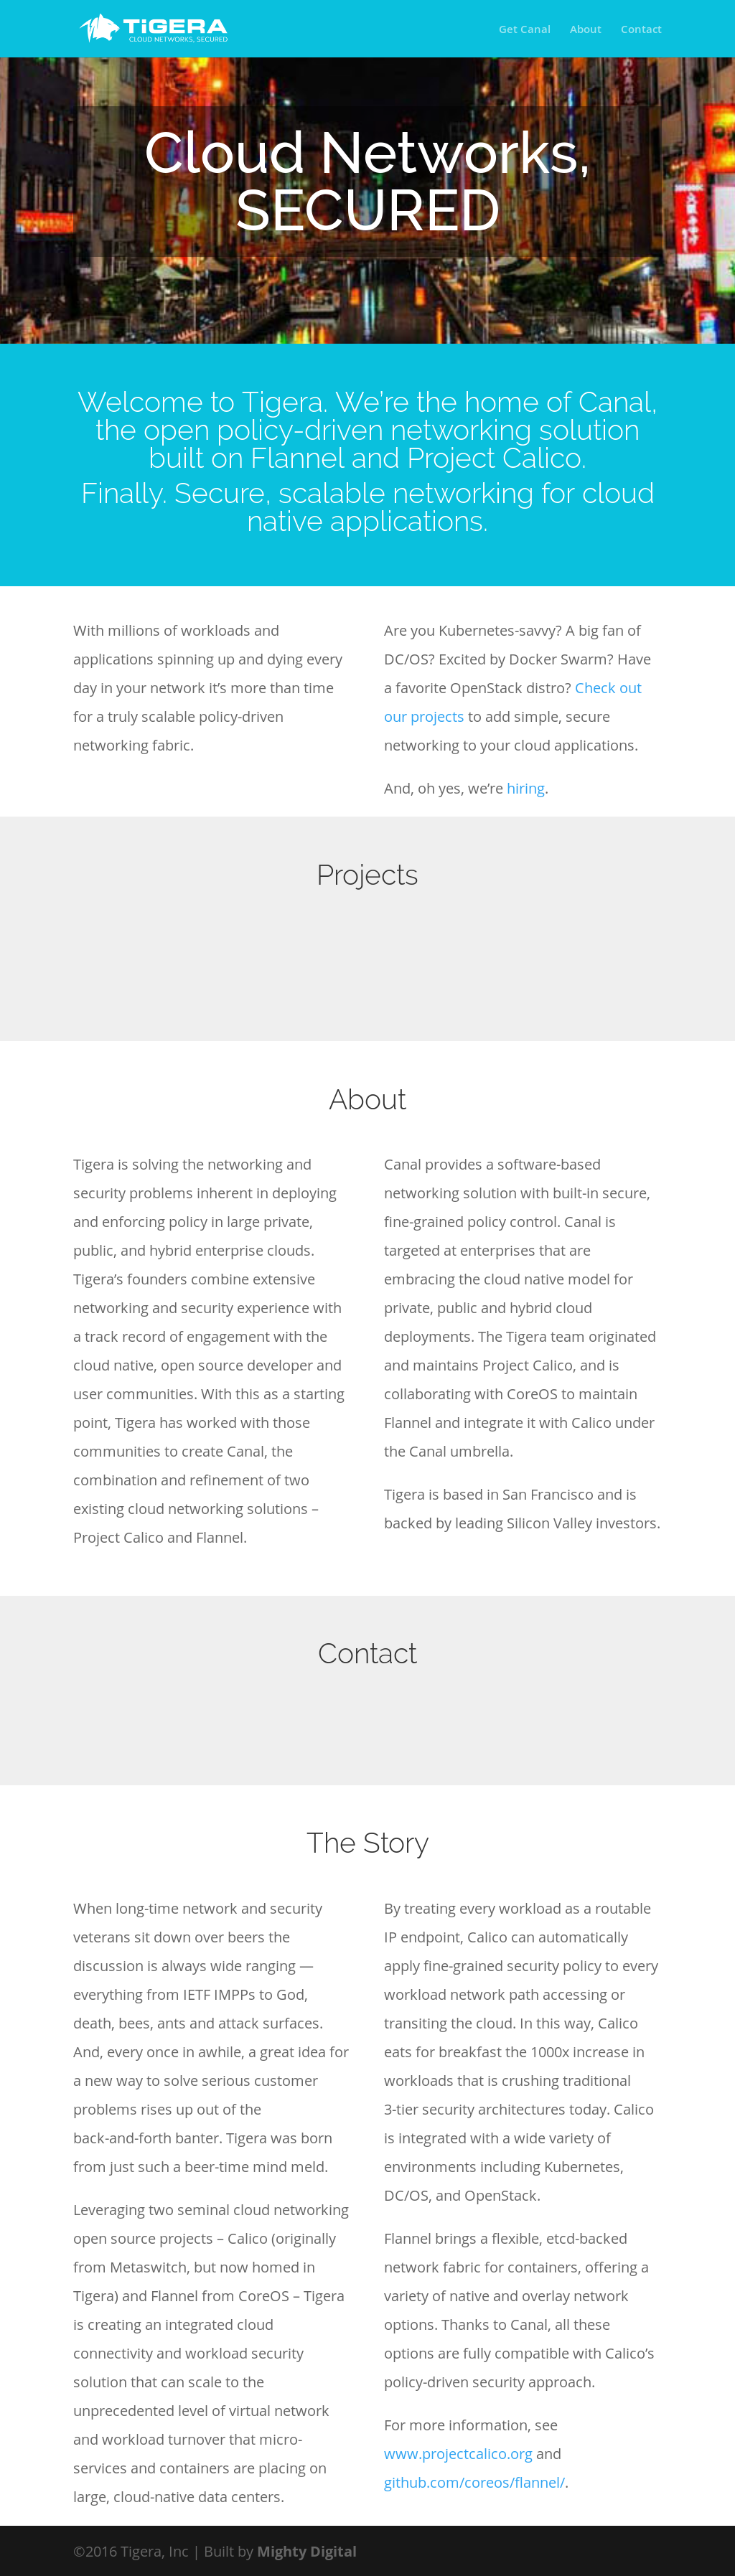 Tigera Competitors, Revenue and Employees - Owler Company Profile